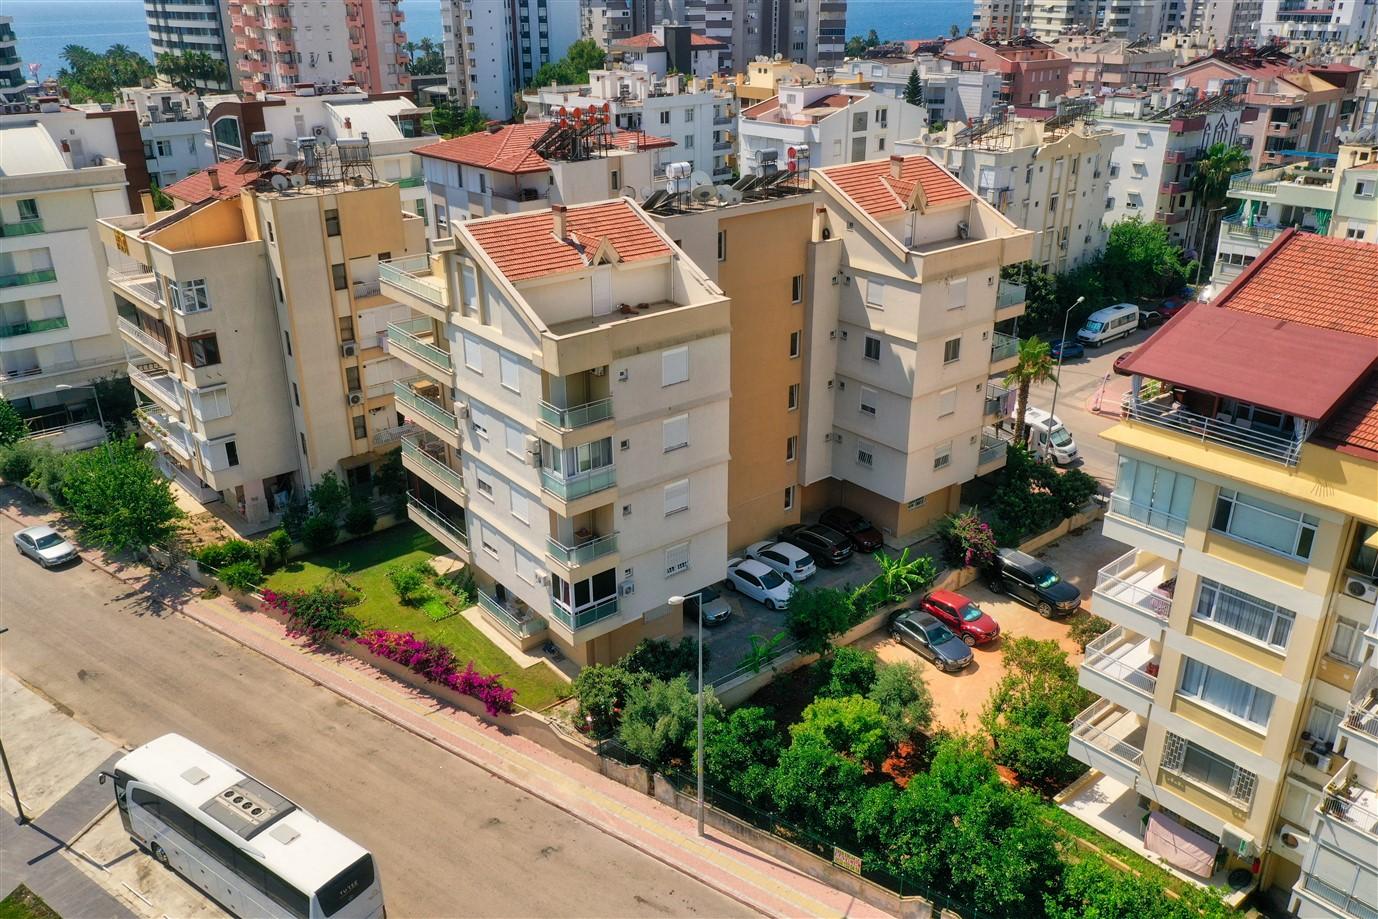 Четырёхкомнатная квартира в Анталье - Фото 2